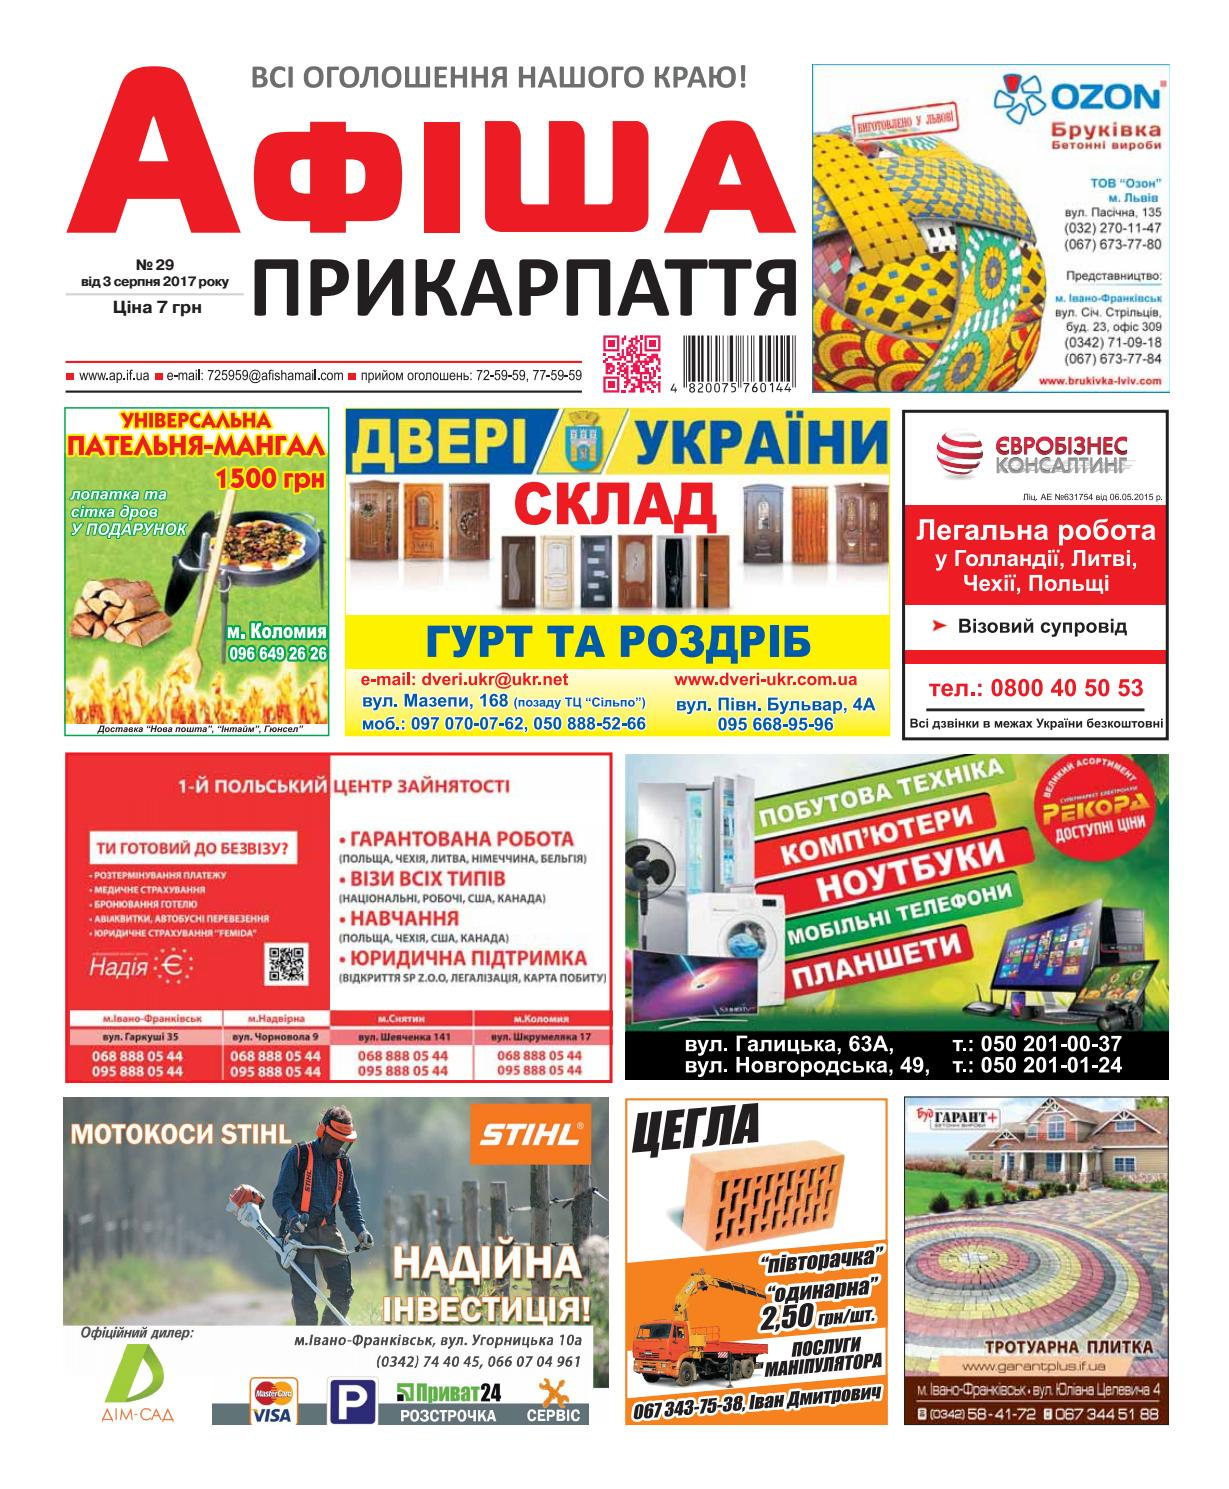 Афіша Прикарпаття 29 by Olya Olya - issuu 1a229afef87cd